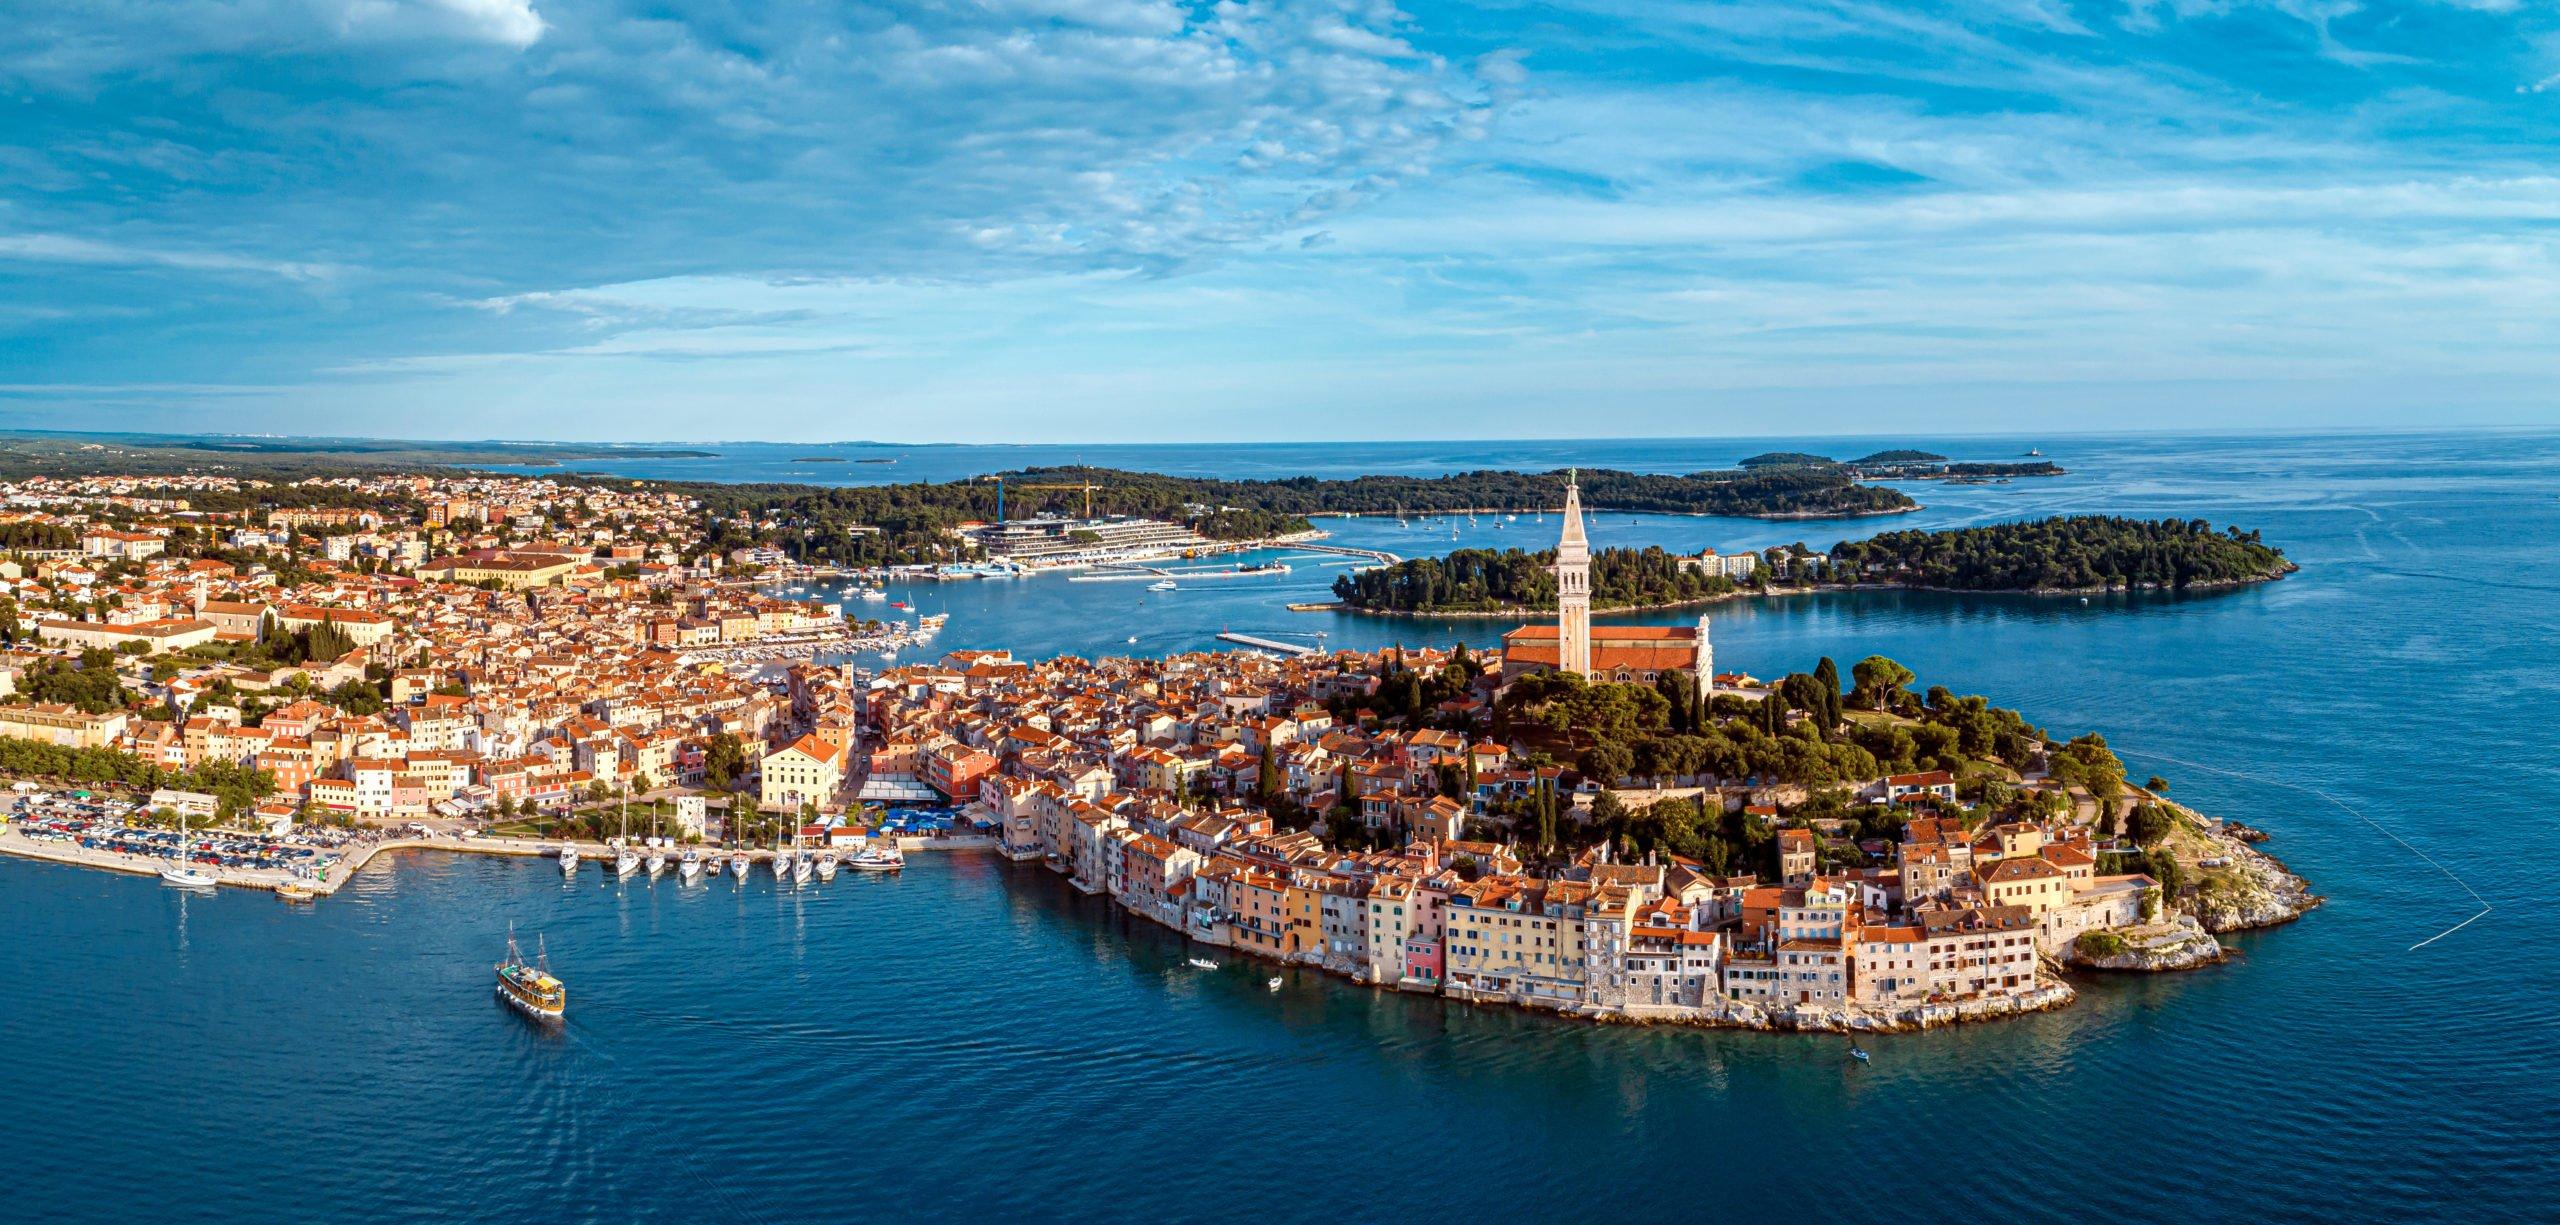 Experience Beautiful Towns On The Adriatic Coast On The On The Best Of Adriatic Sea 11 Day Package Tour (slovenia-croatia-bosnia And Herzegovina-montenegro)